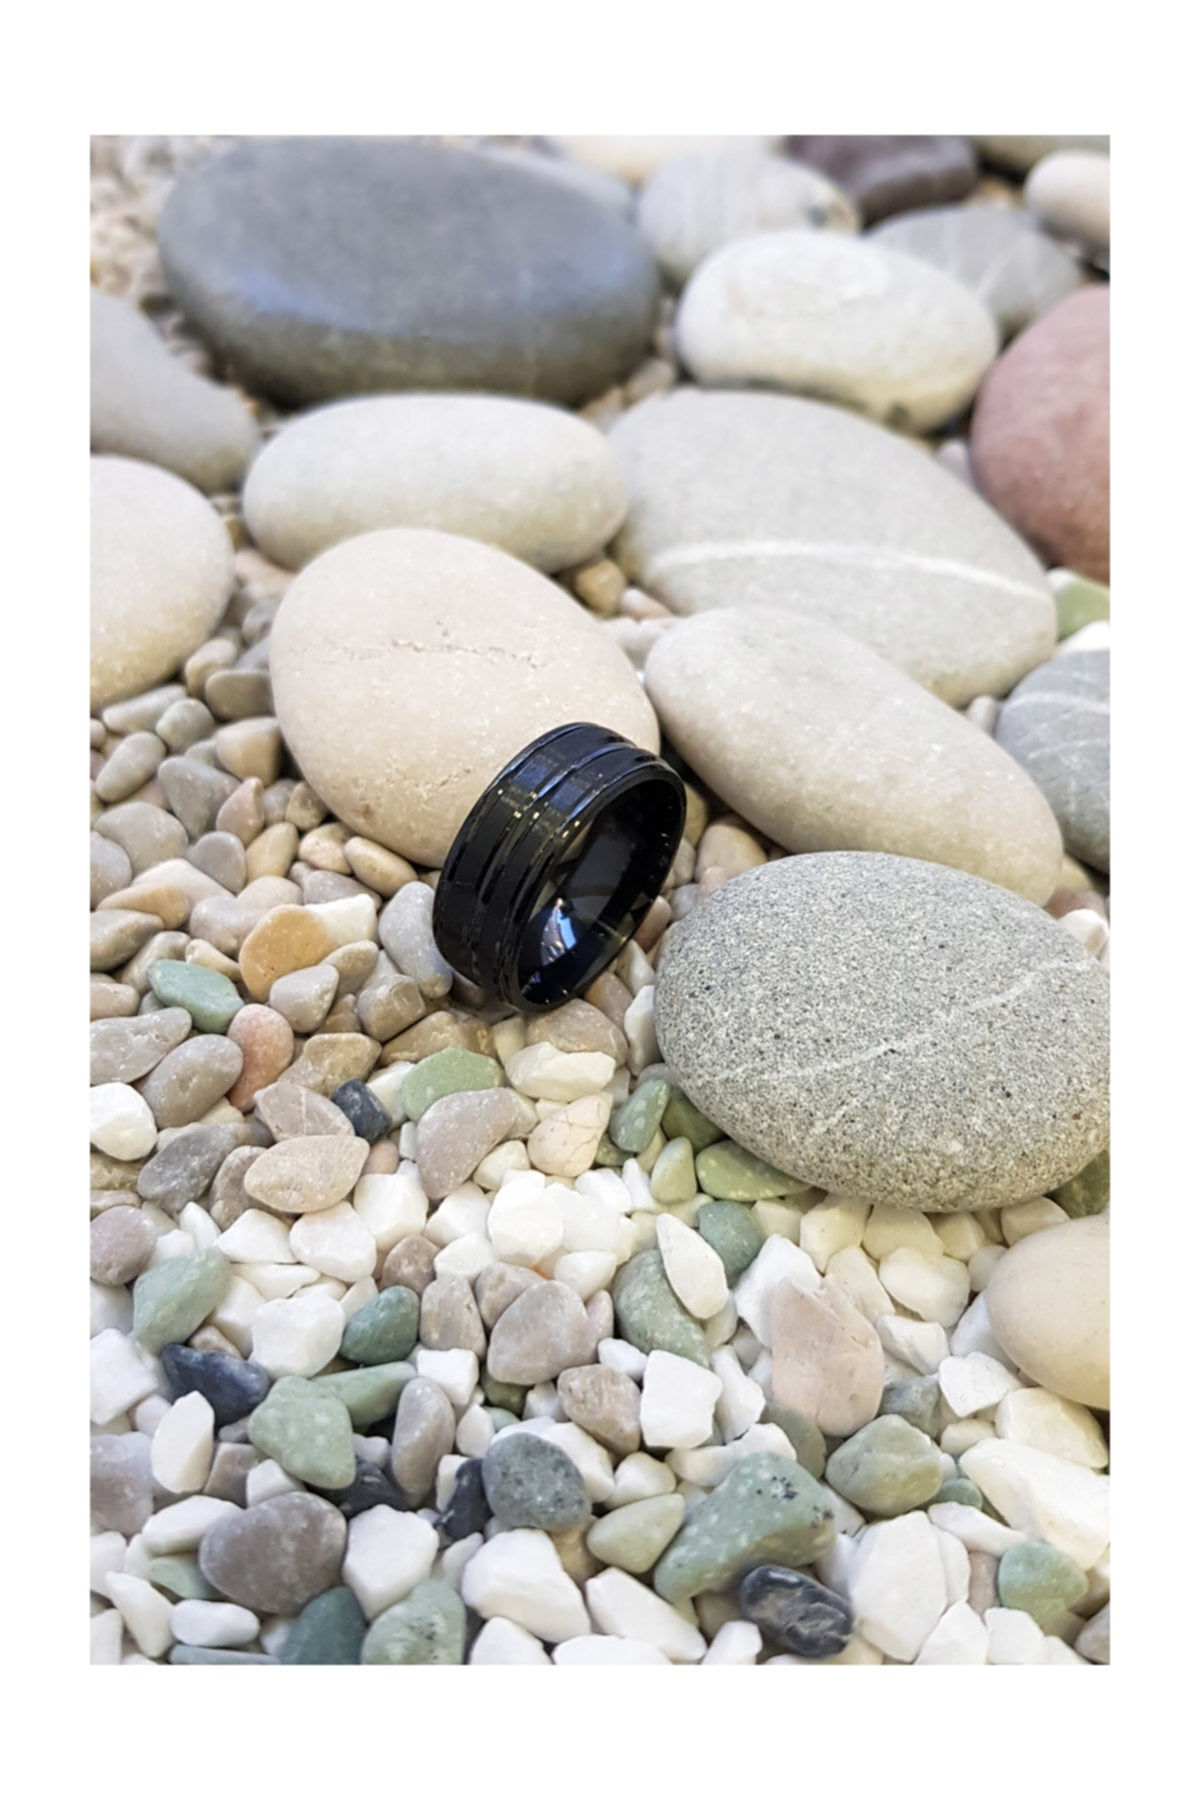 Chavin Unisex Siyah ip Kaplama Çelik Yüzük Alyans ehy-ehy-ec43sy 2